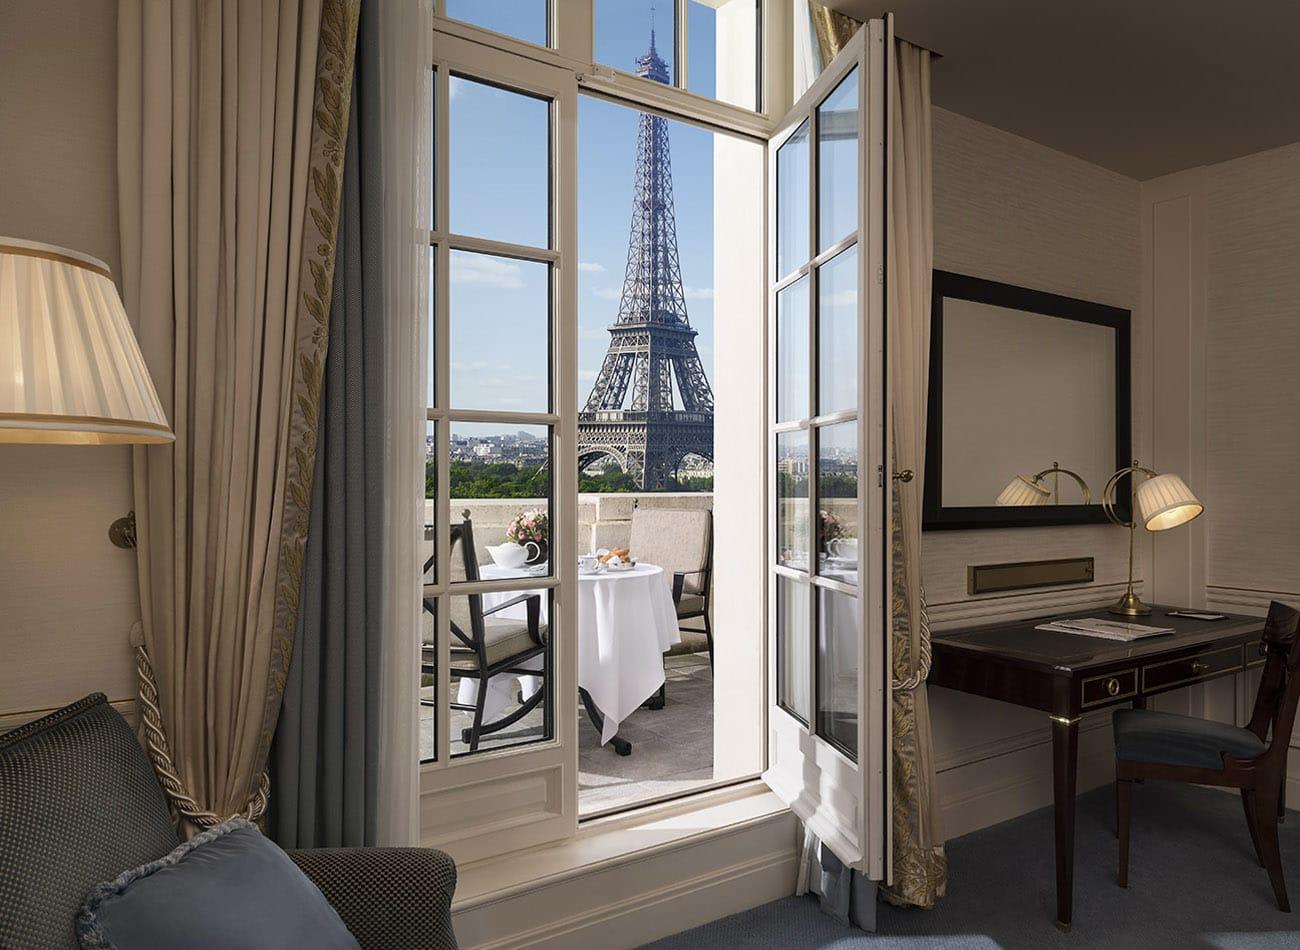 Eiffel Tower View Room balcony